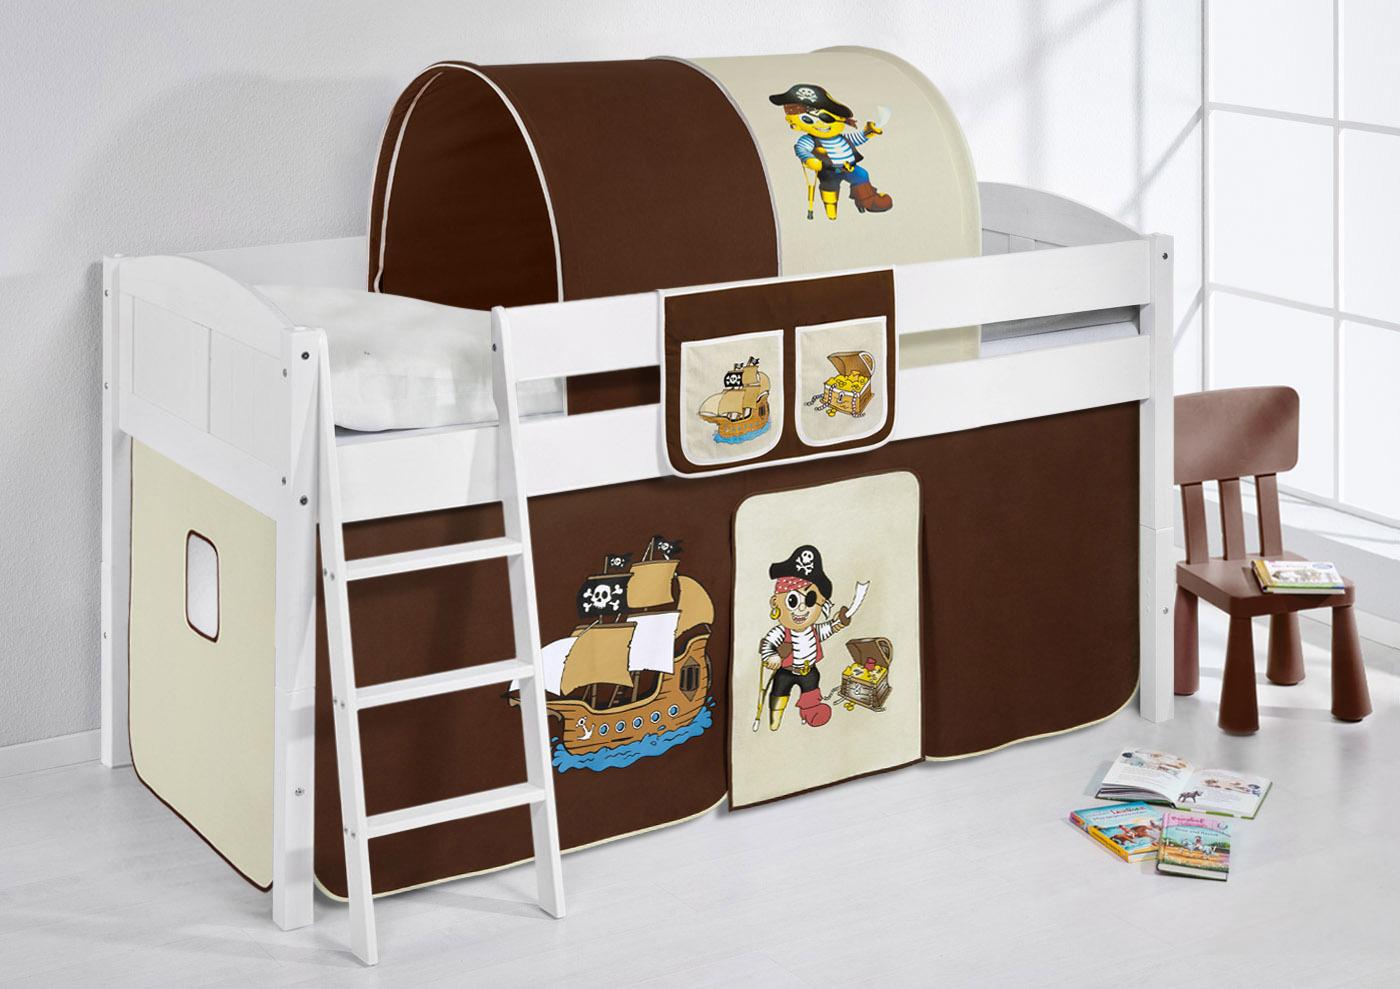 spielbett hochbett kinderbett bett umbaubar zum einzelbett inkl vorhang ebay. Black Bedroom Furniture Sets. Home Design Ideas